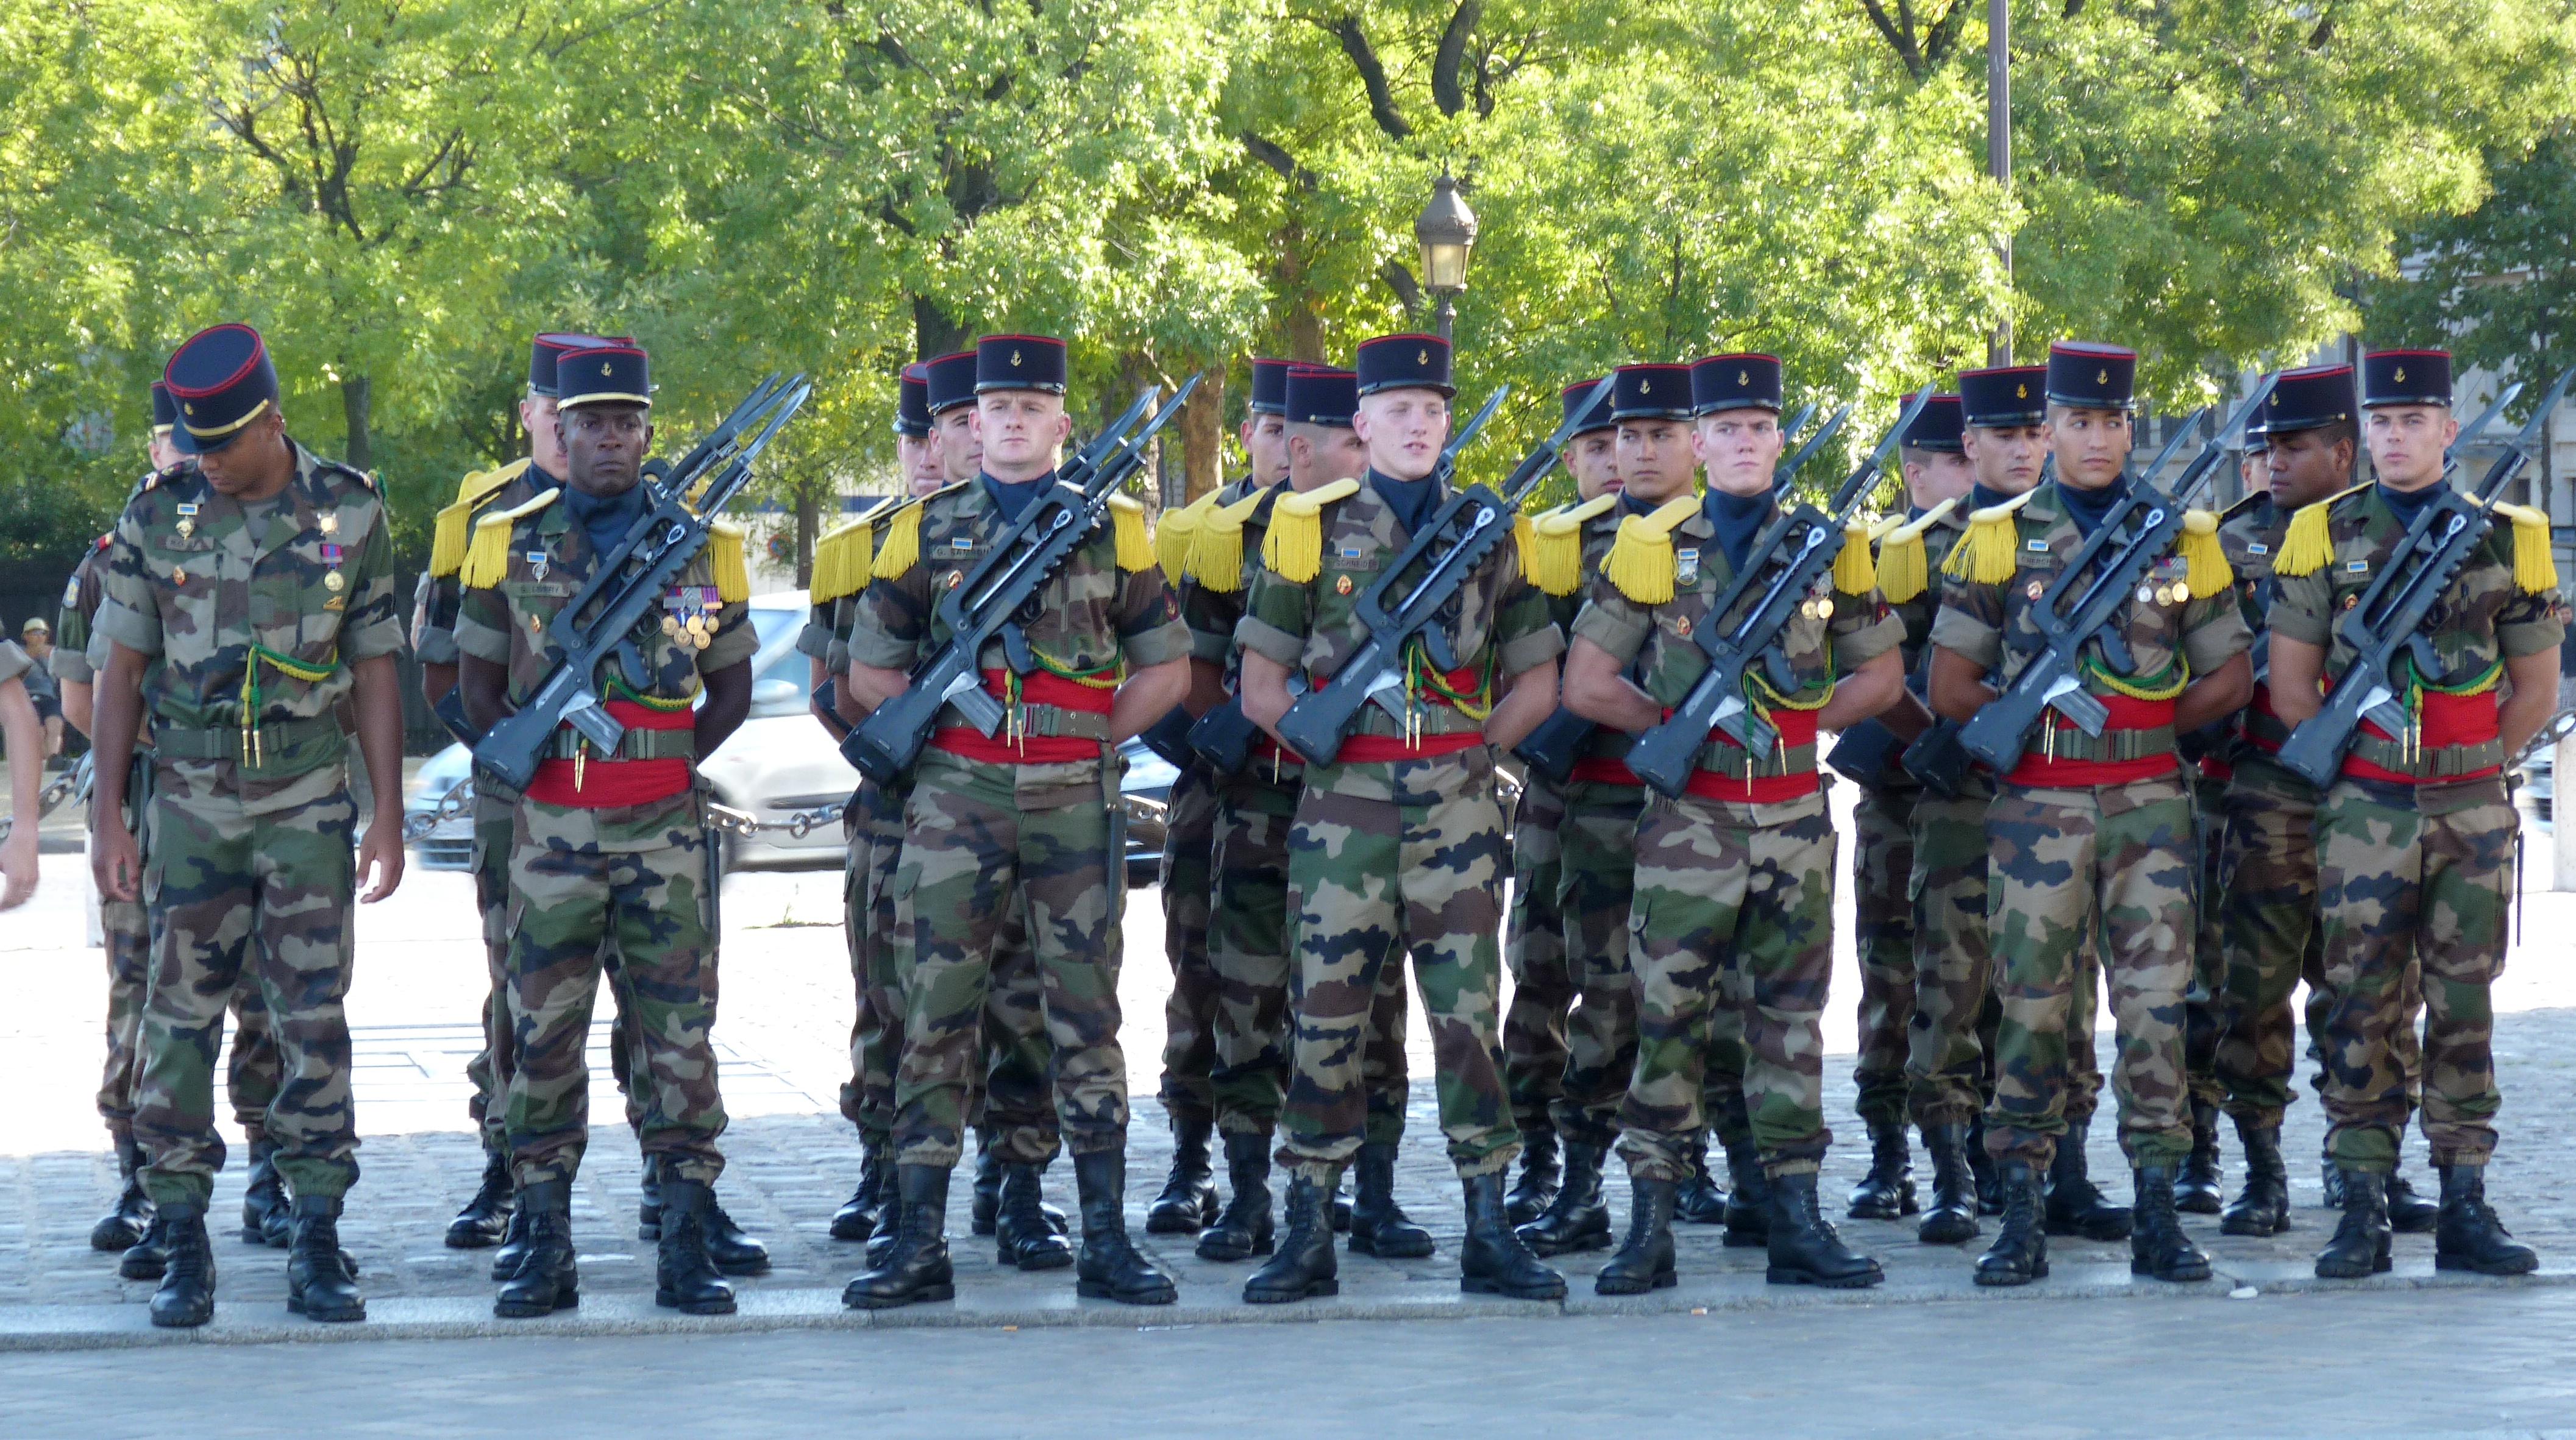 La Compagnie Du Caf Ef Bf Bd Th Ef Bf Bdatre Nantes Adresse